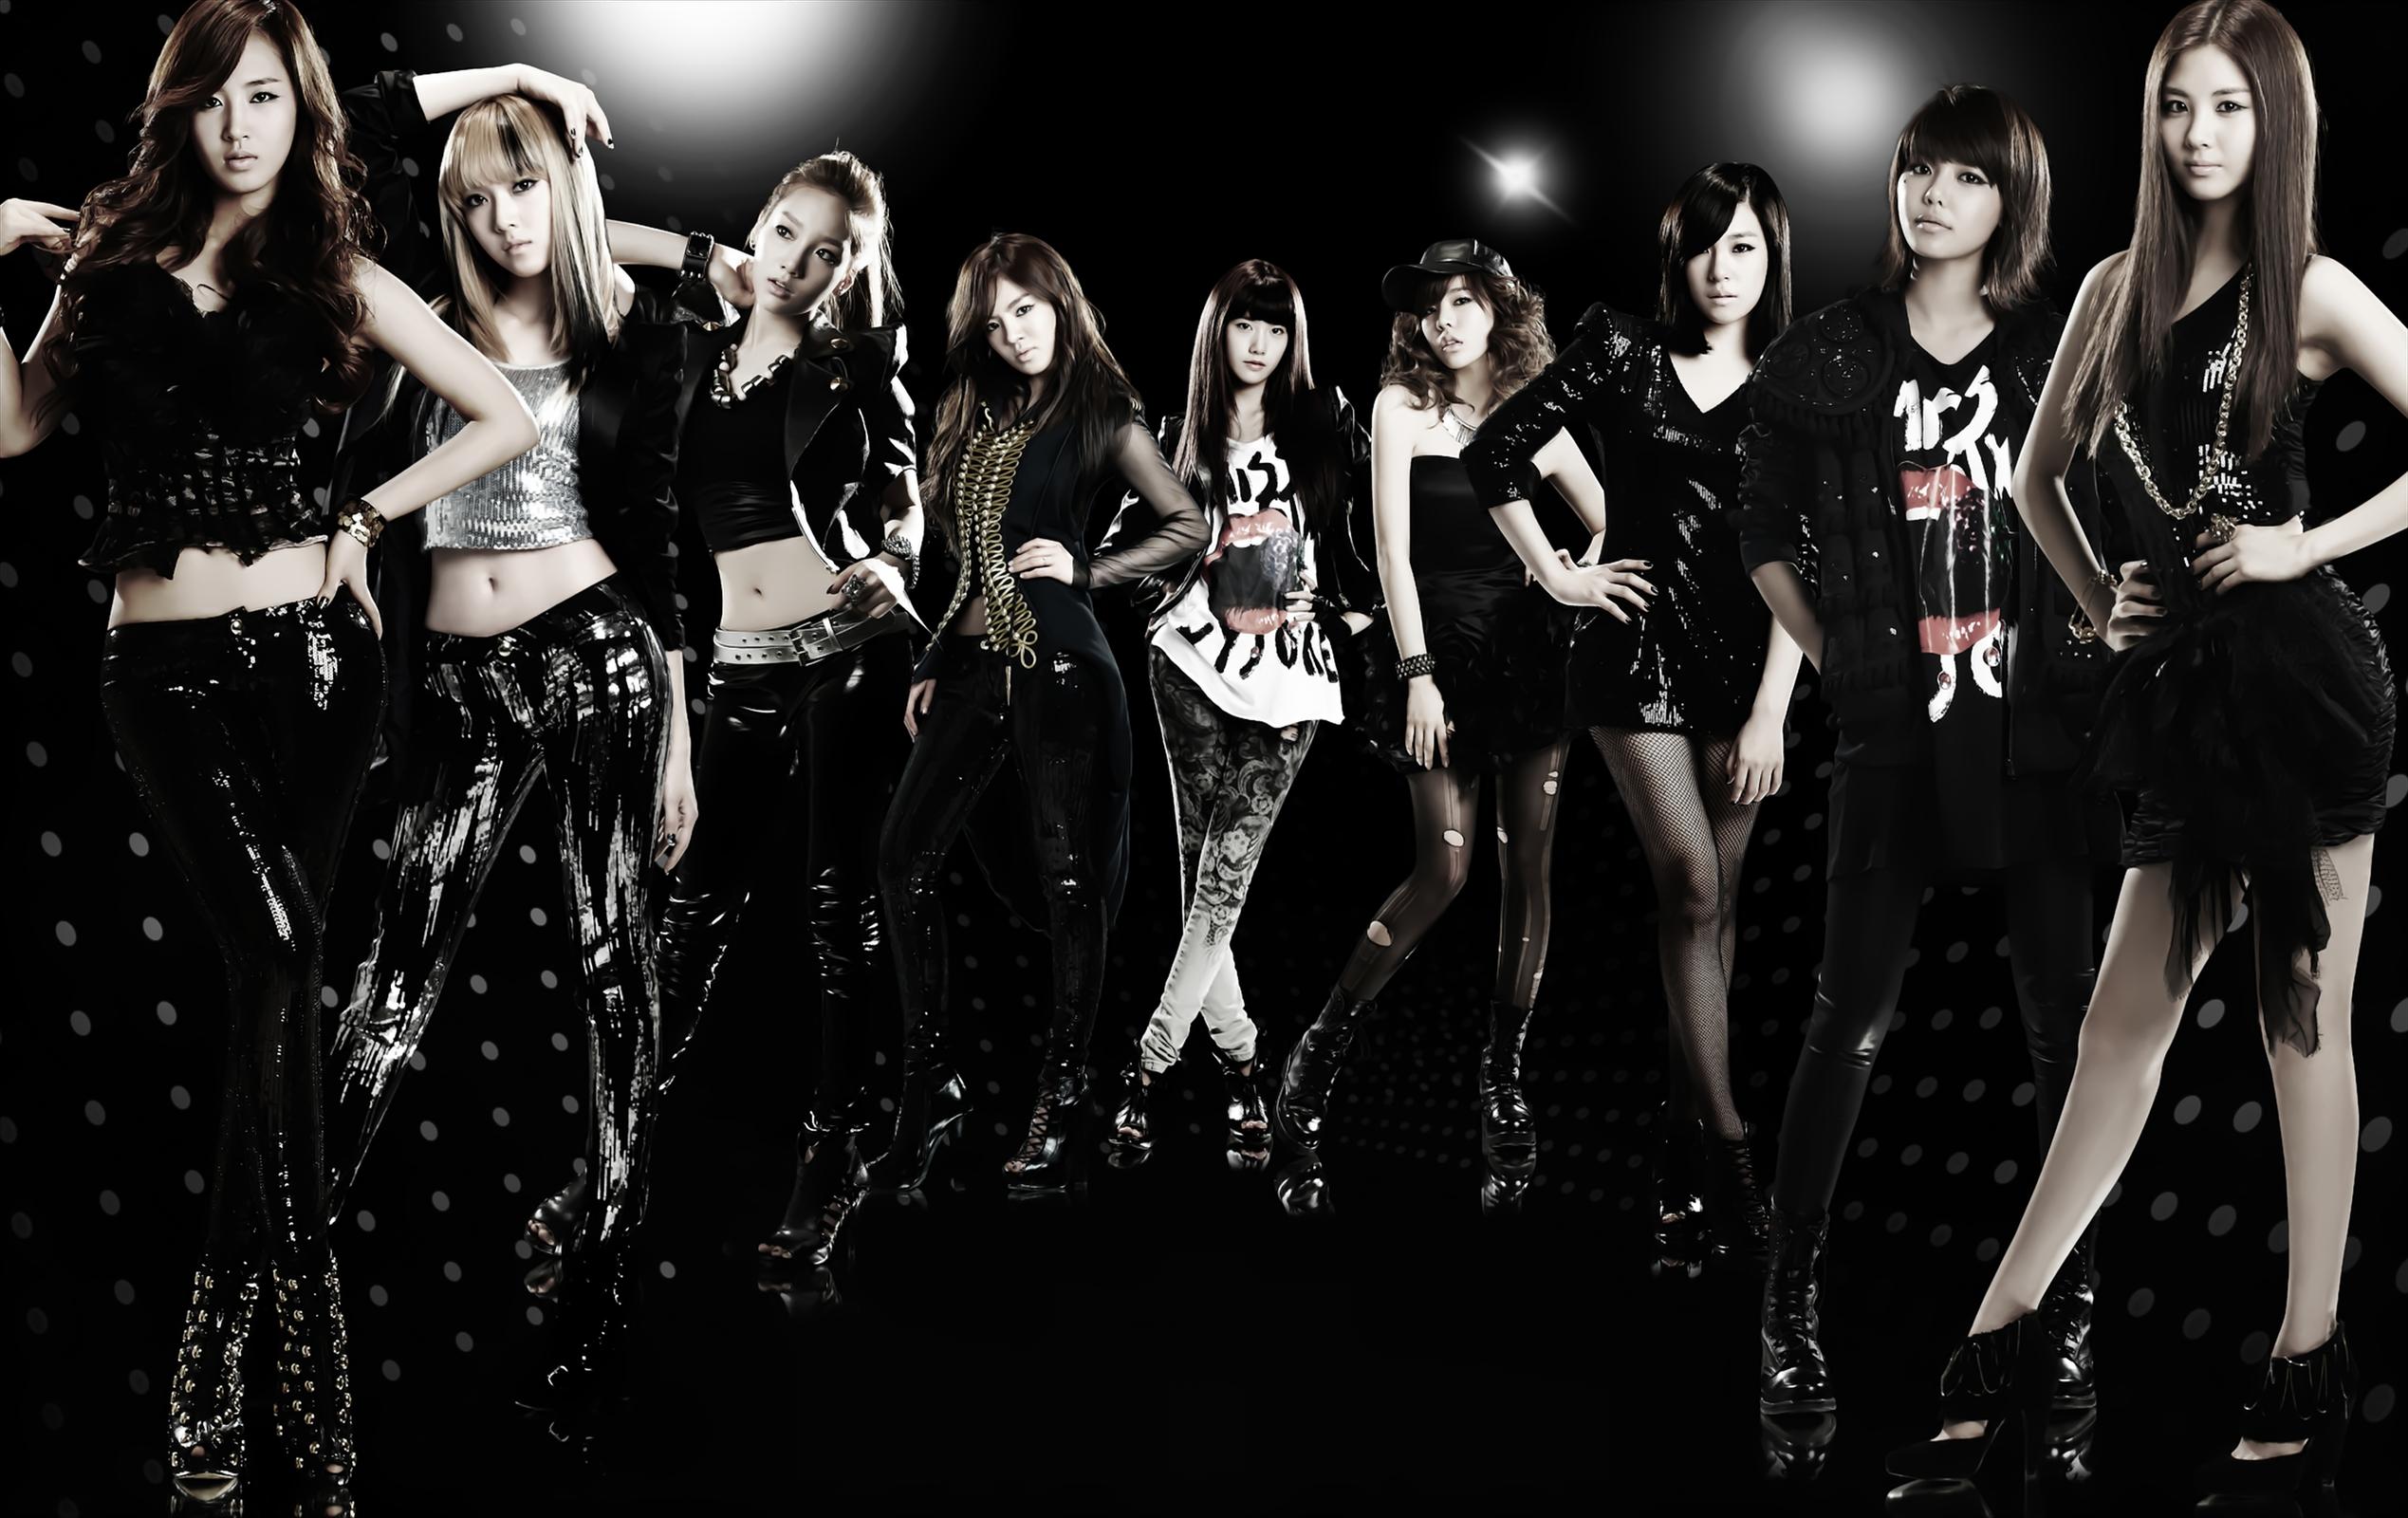 Girls Generation Wallpaper 1415 Asiachan Kpop Image Board